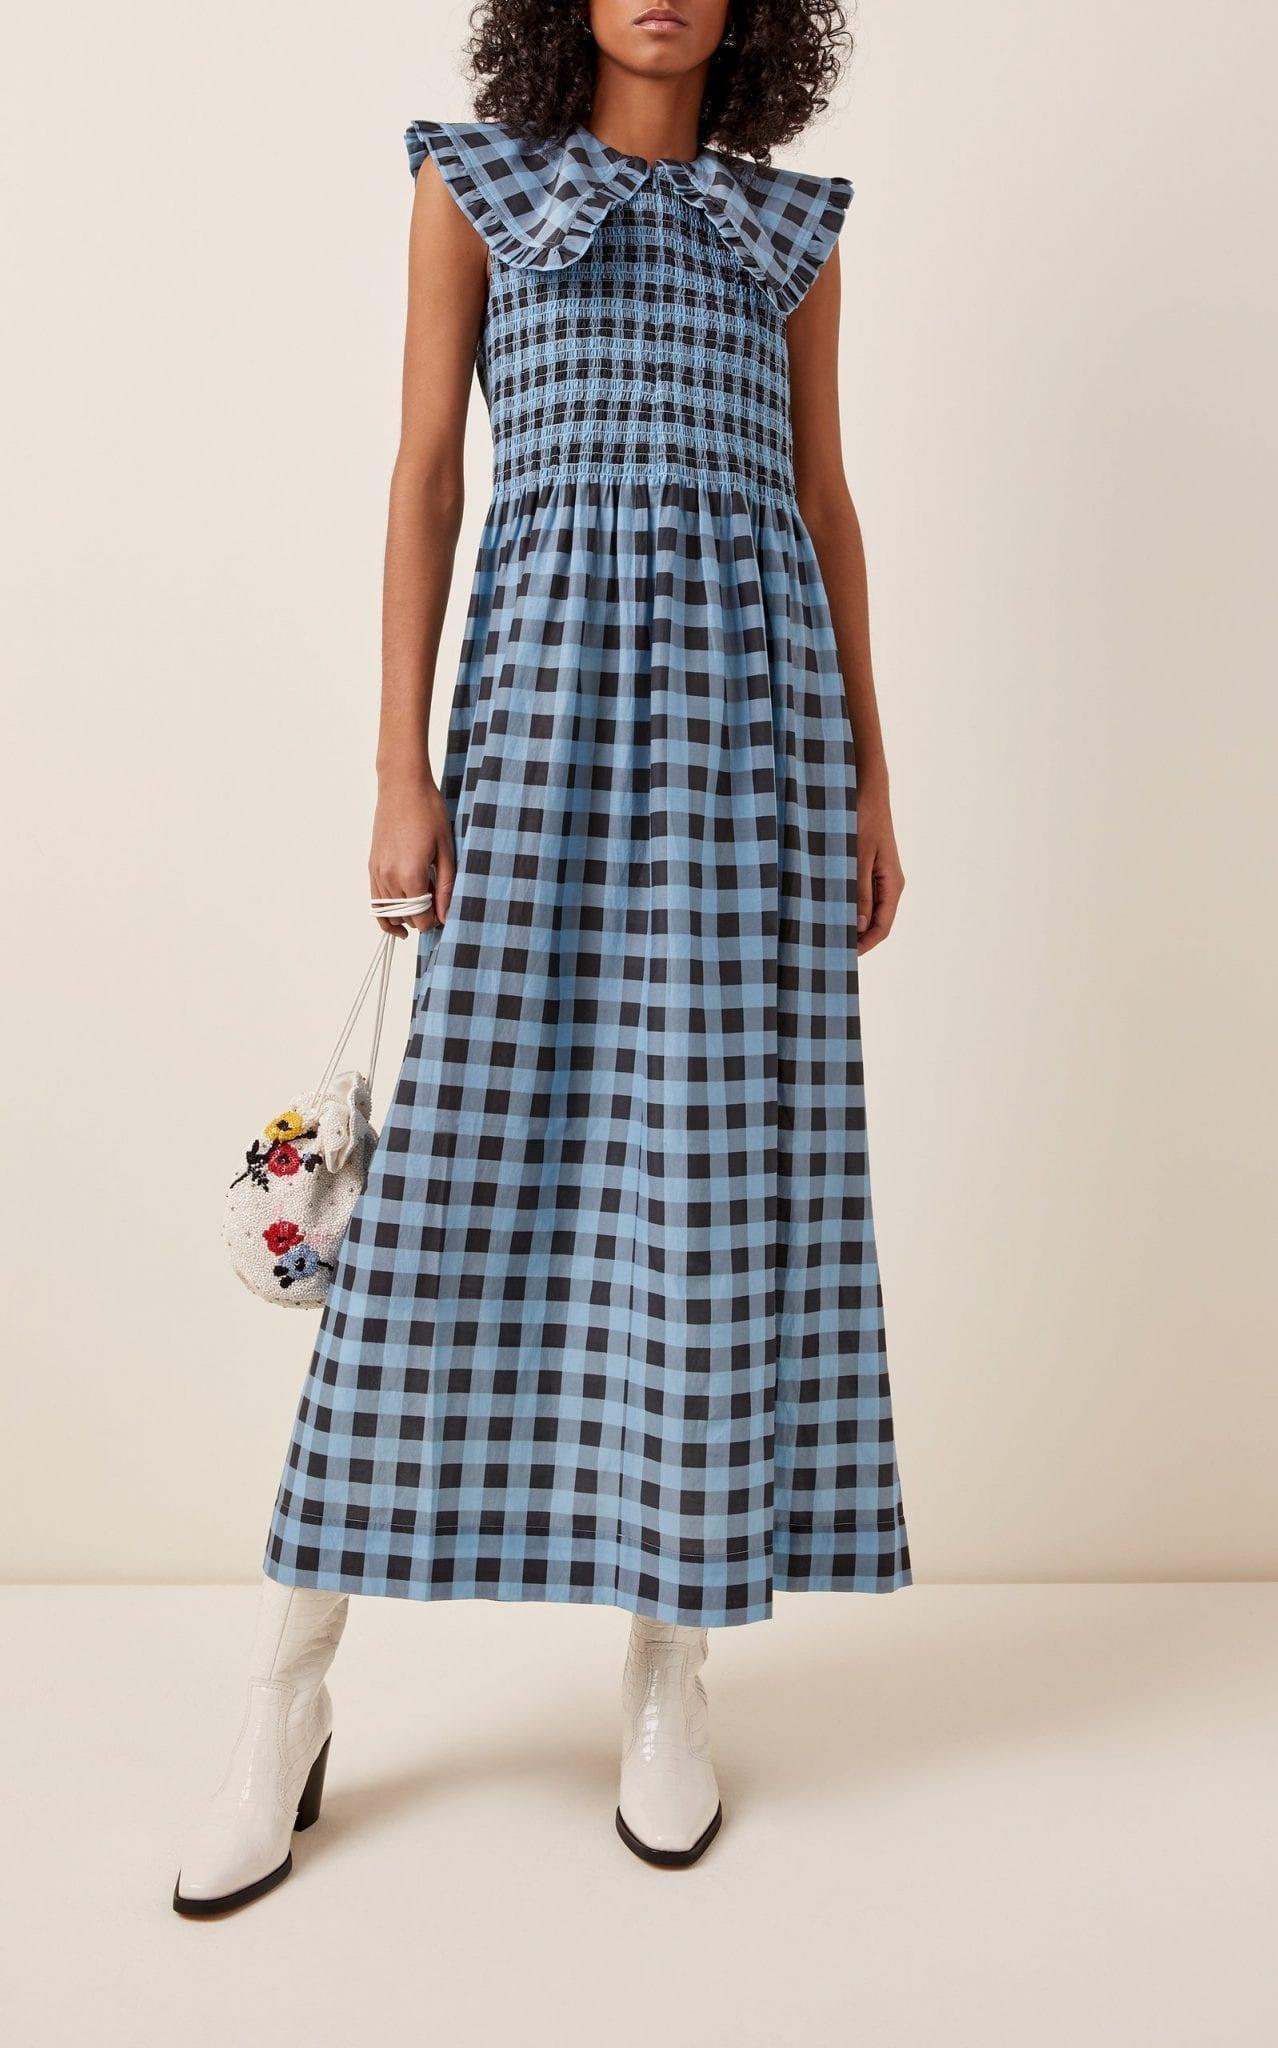 GANNI Printed Smocked Cotton-Blend Midi Dress